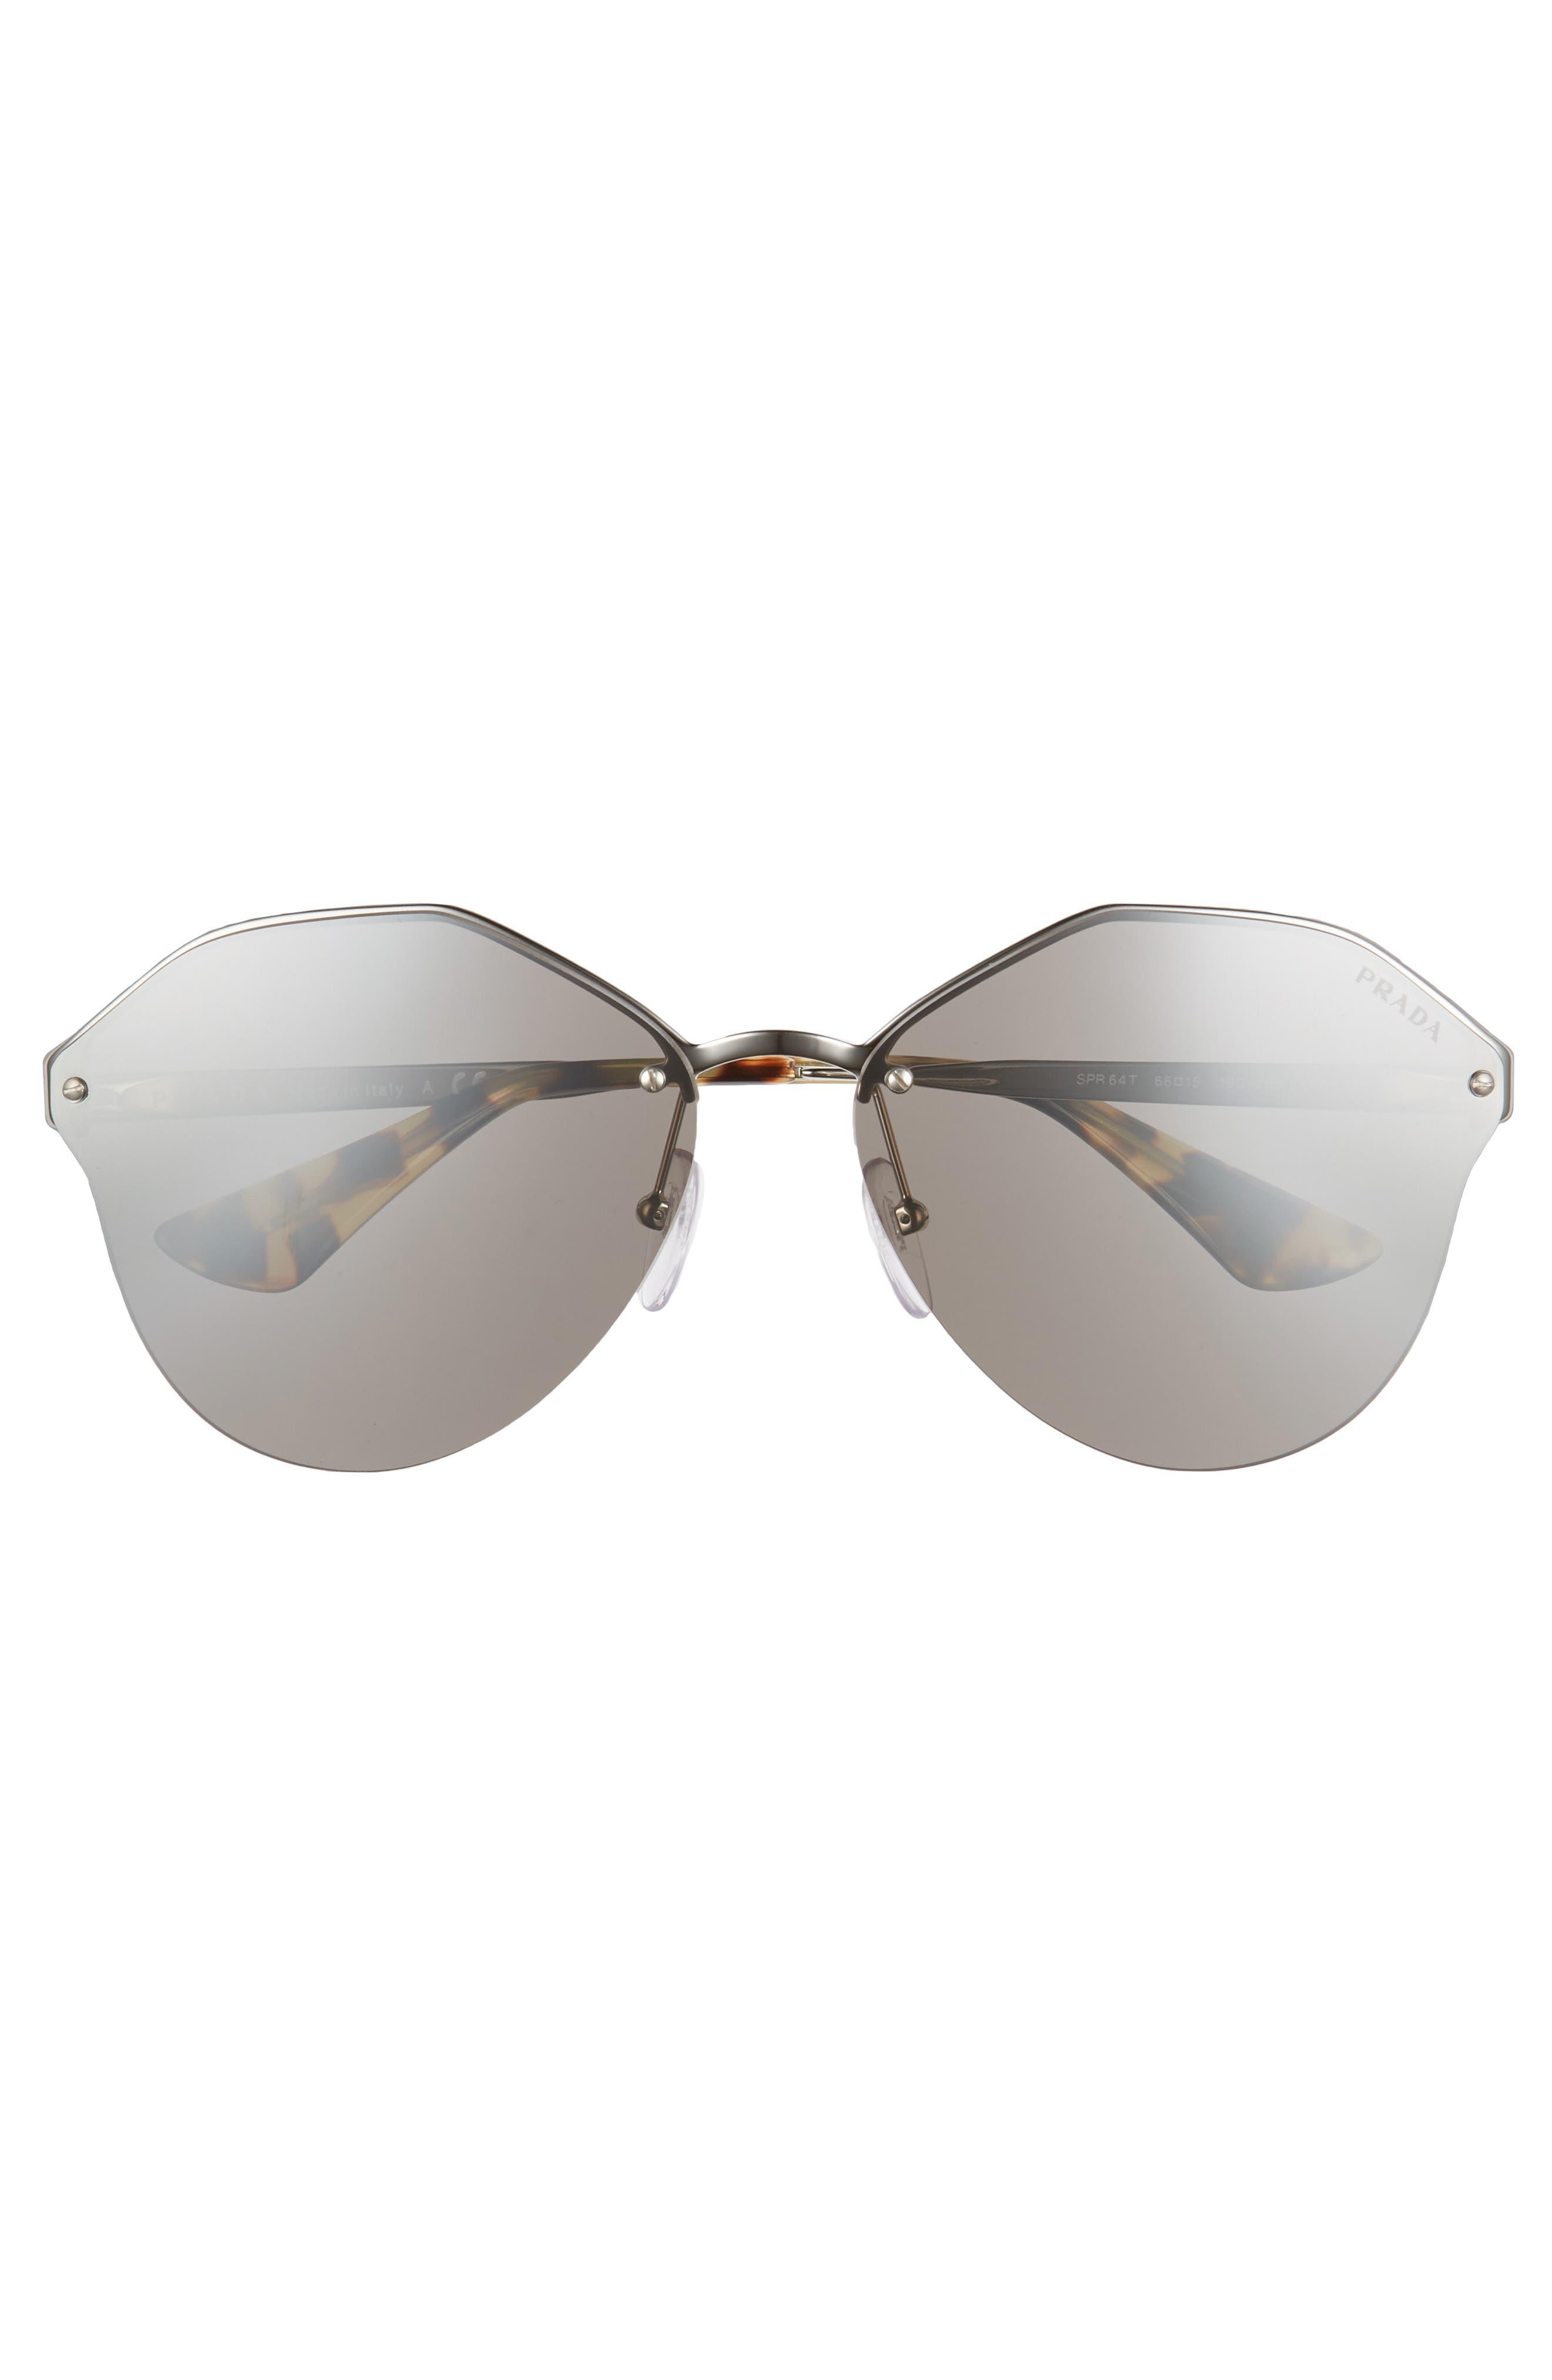 66mm Oversize Rimless Sunglasses,                             Alternate thumbnail 3, color,                             Brown Mirror